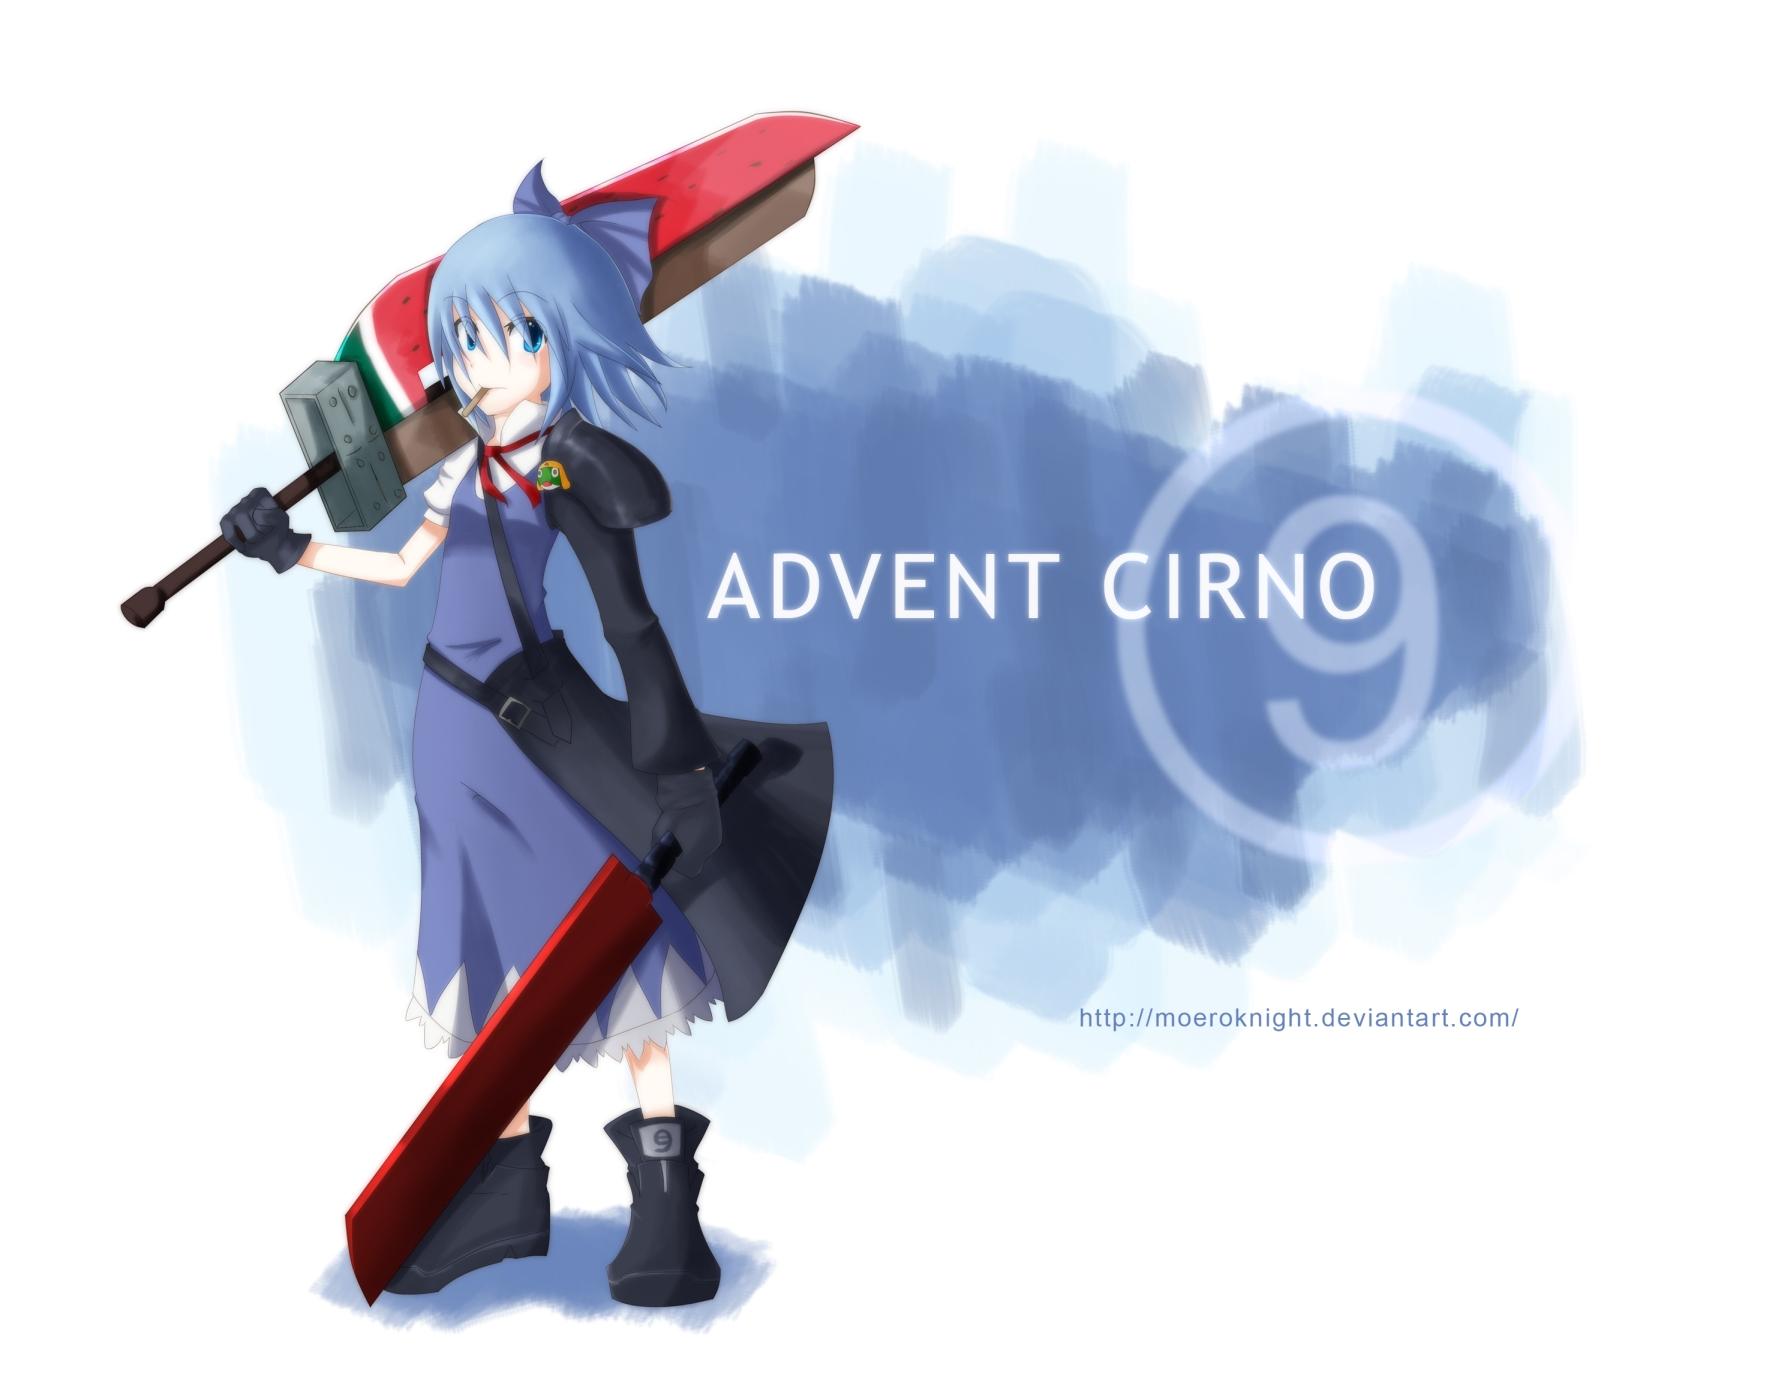 Koon Cirno [Ficha] Advent_Cirno_by_moeroknight